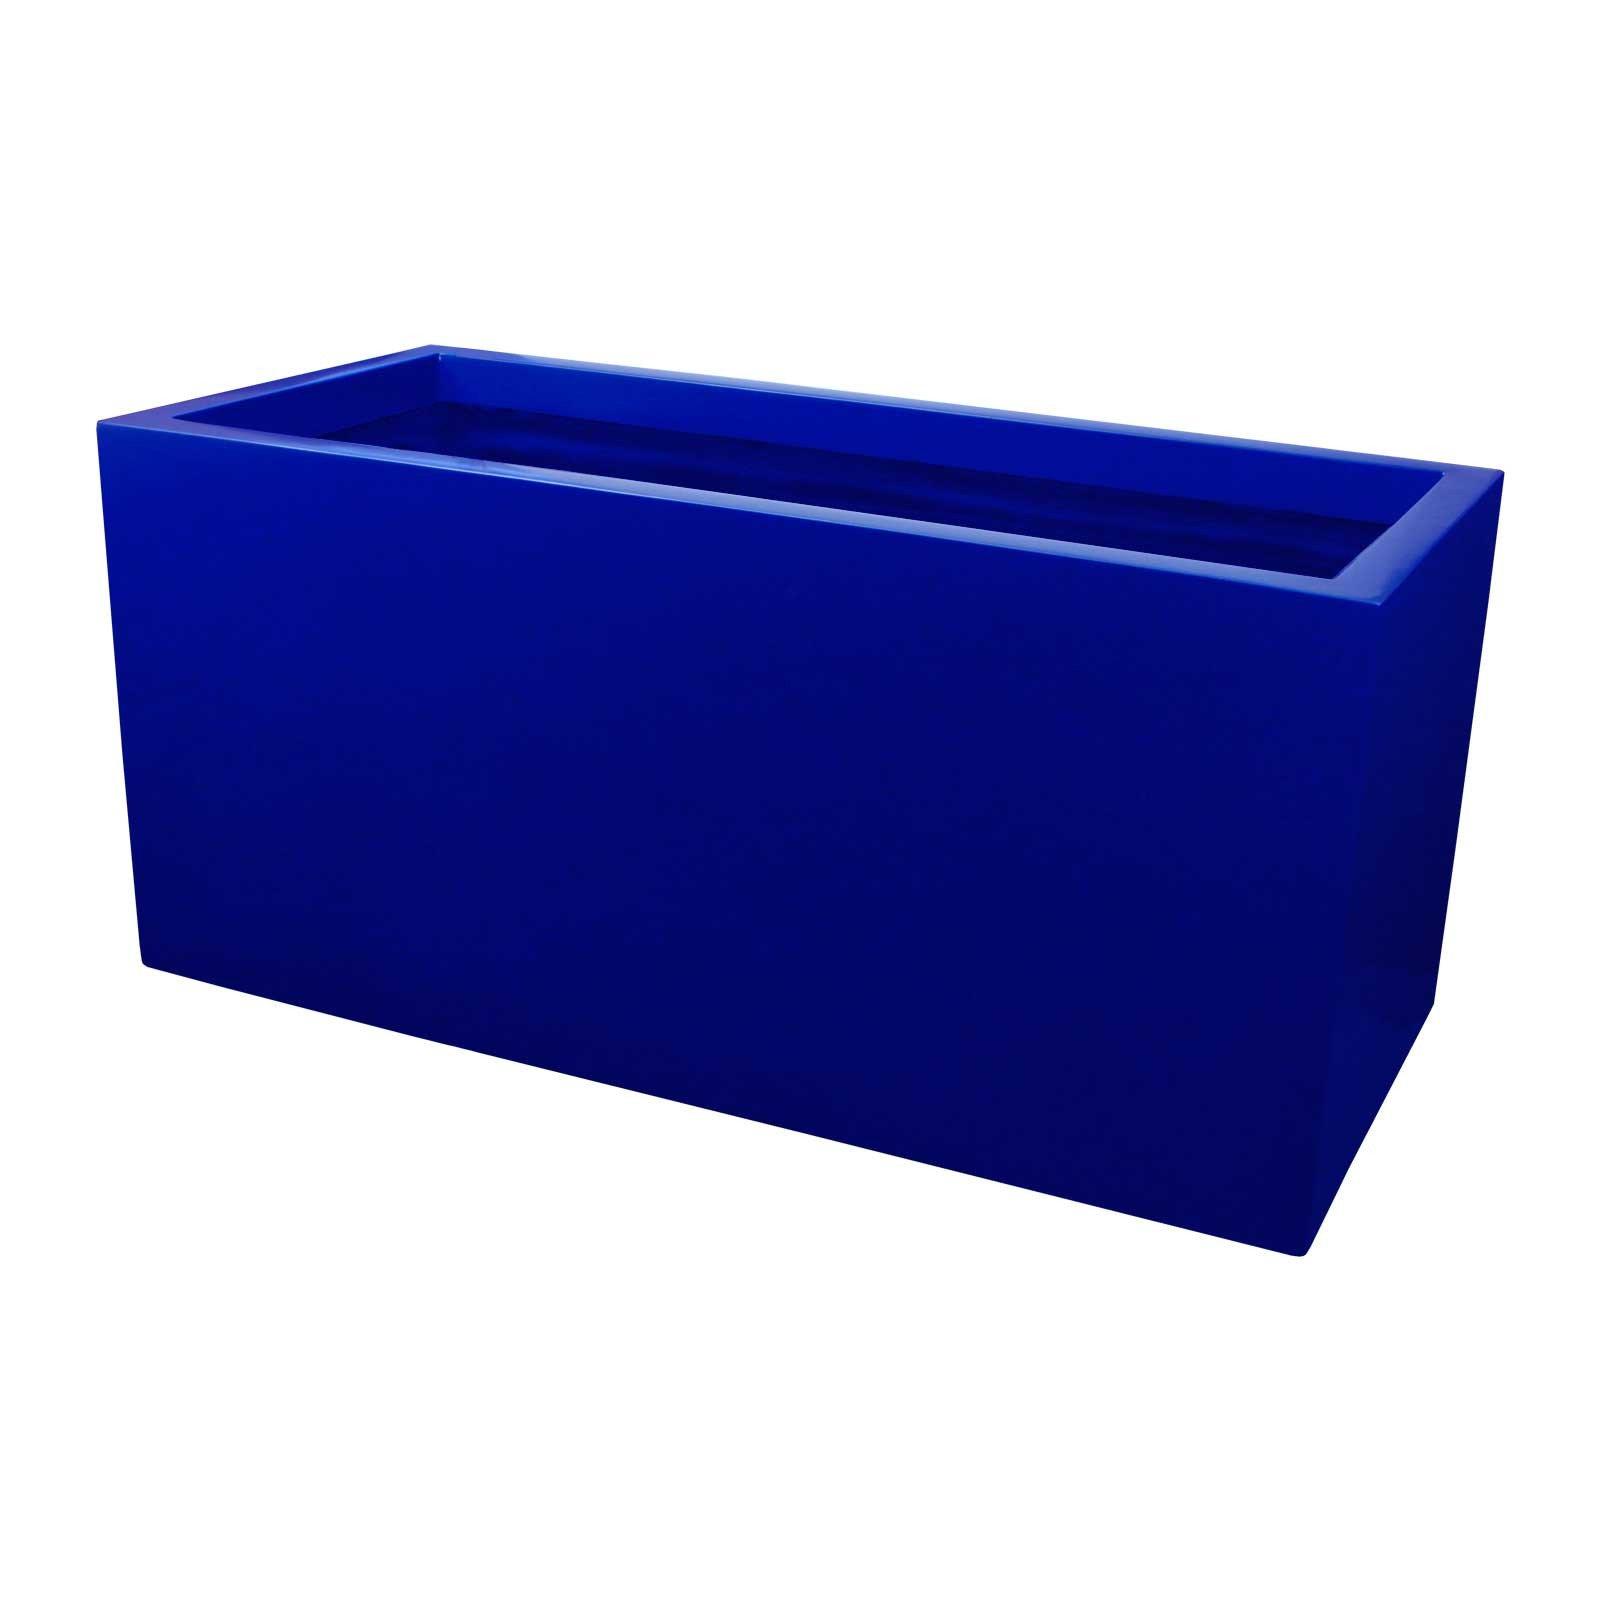 Rectangular Planter Box - 39'L x 17'W x 17'H